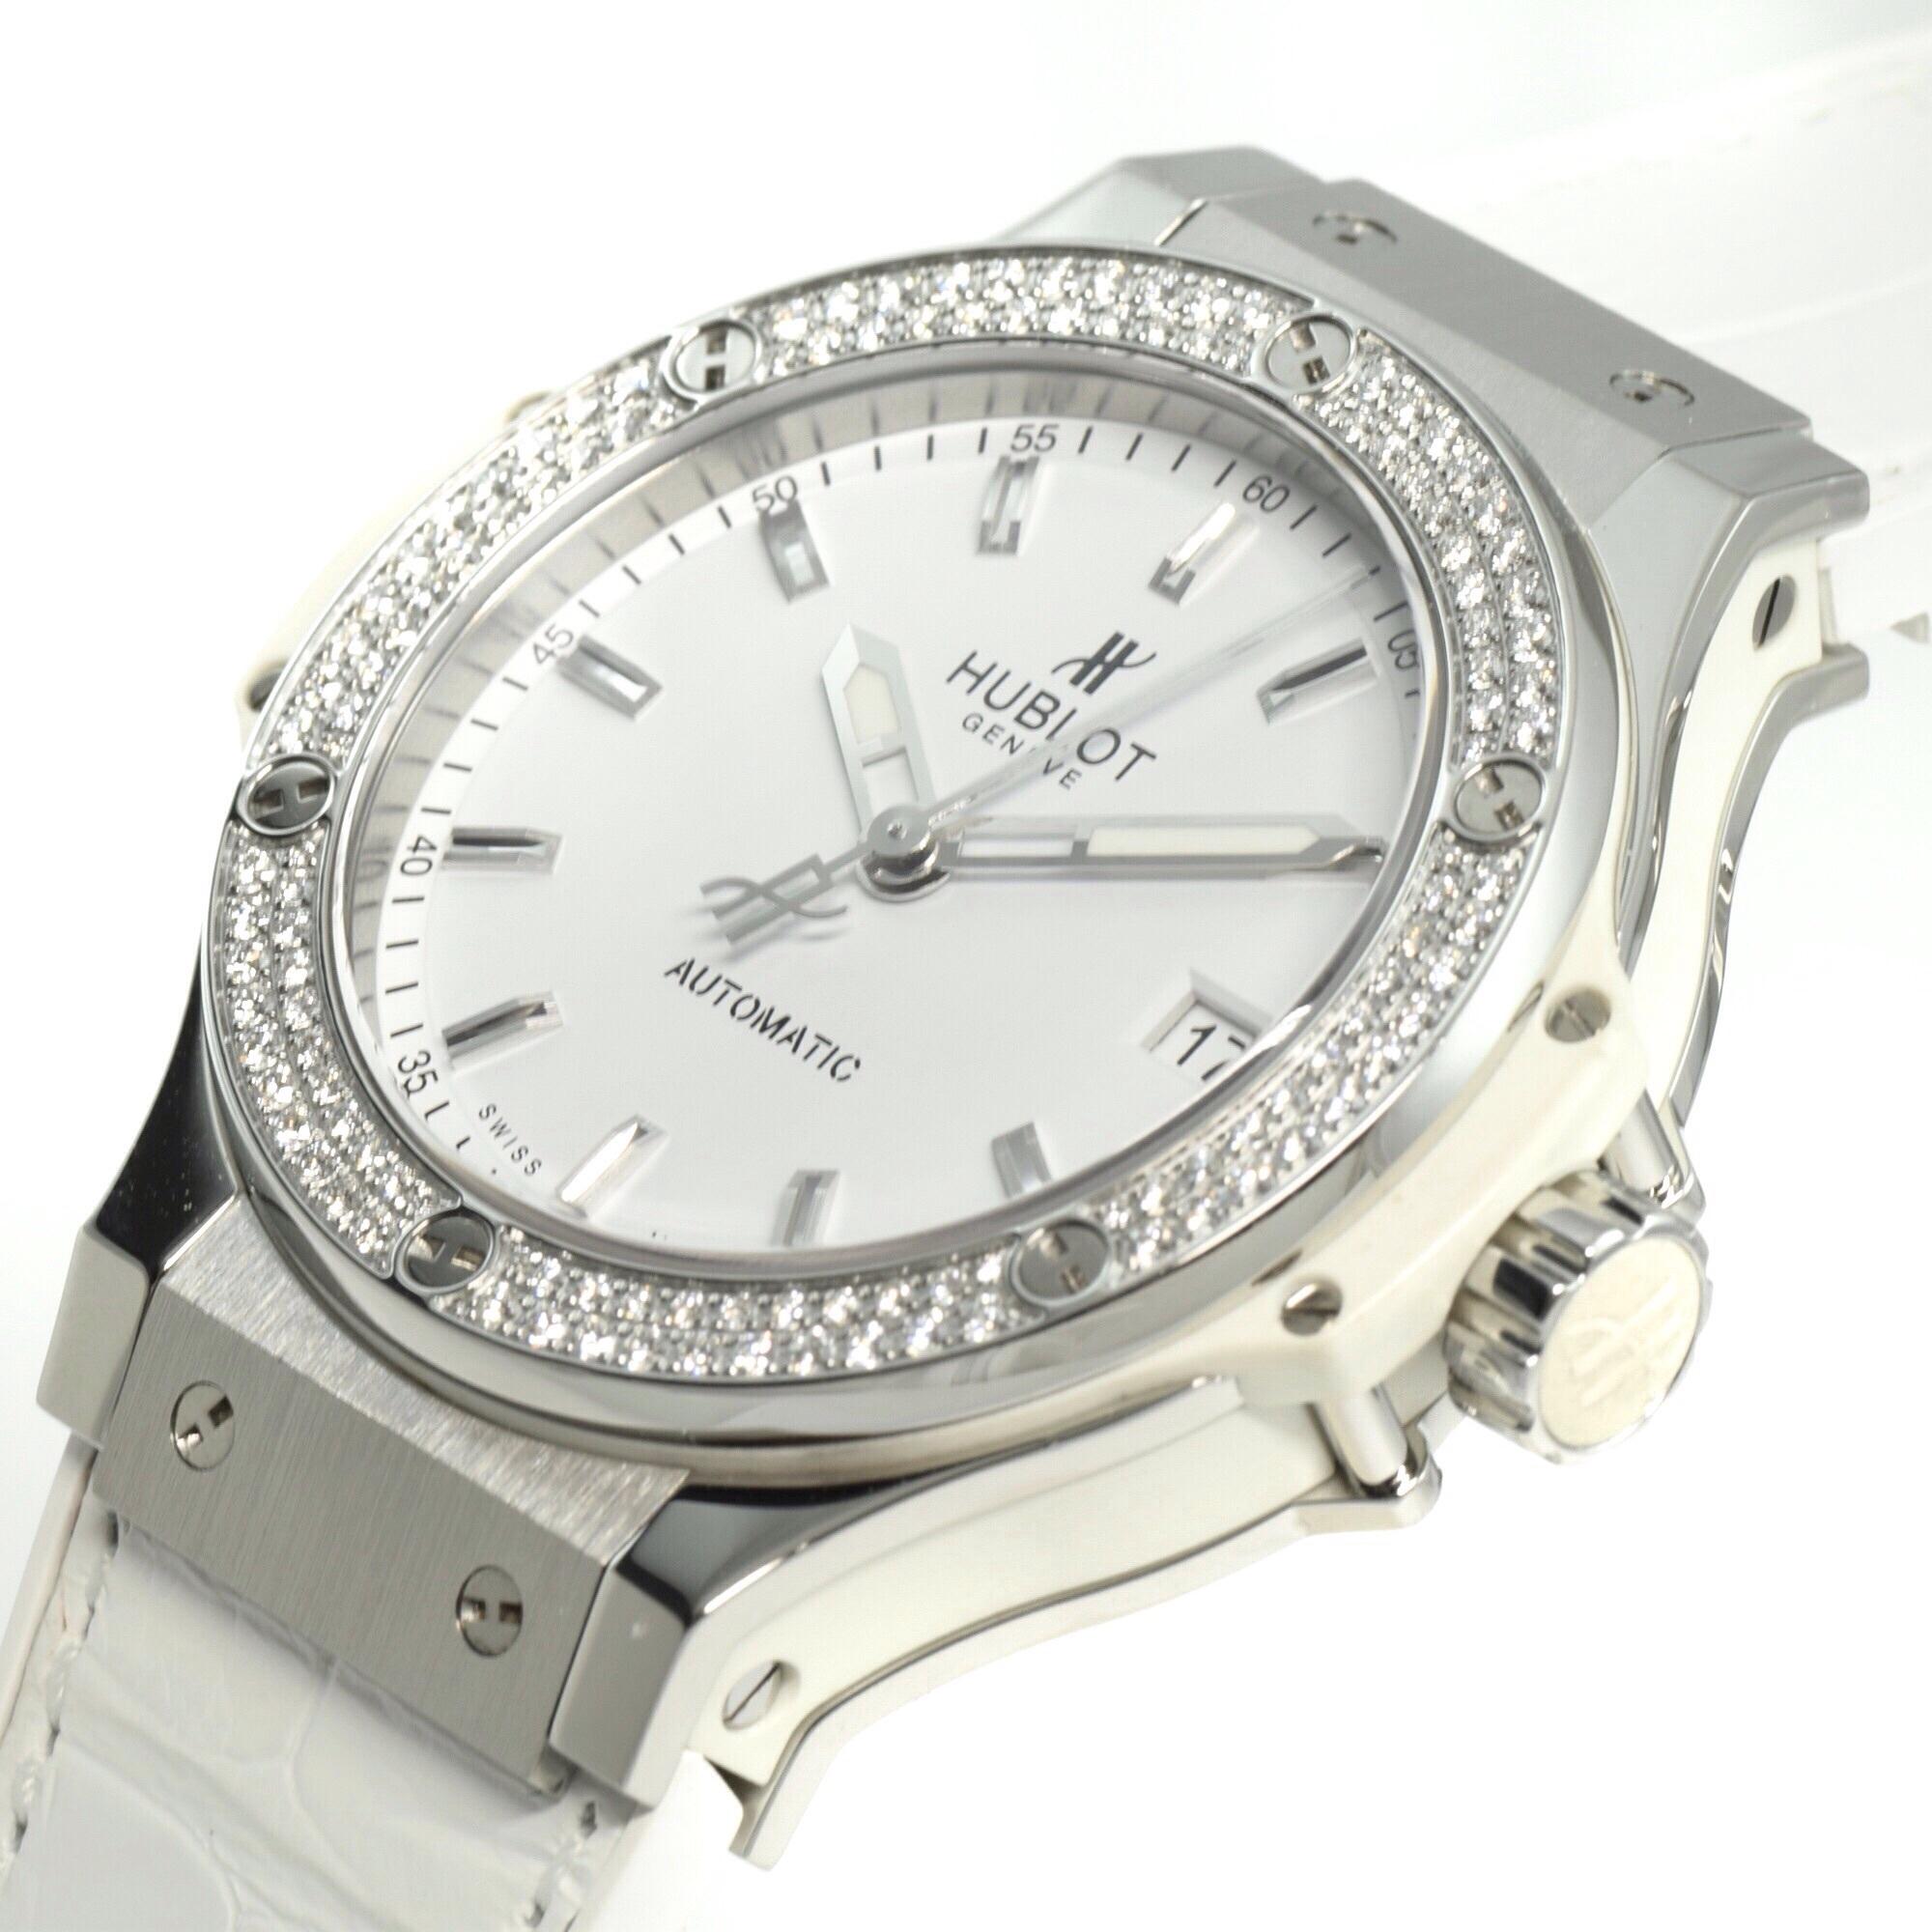 huge selection of 88760 6f46e 中古 ウブロ ビッグバン スチール ホワイト ダイヤモンド ...